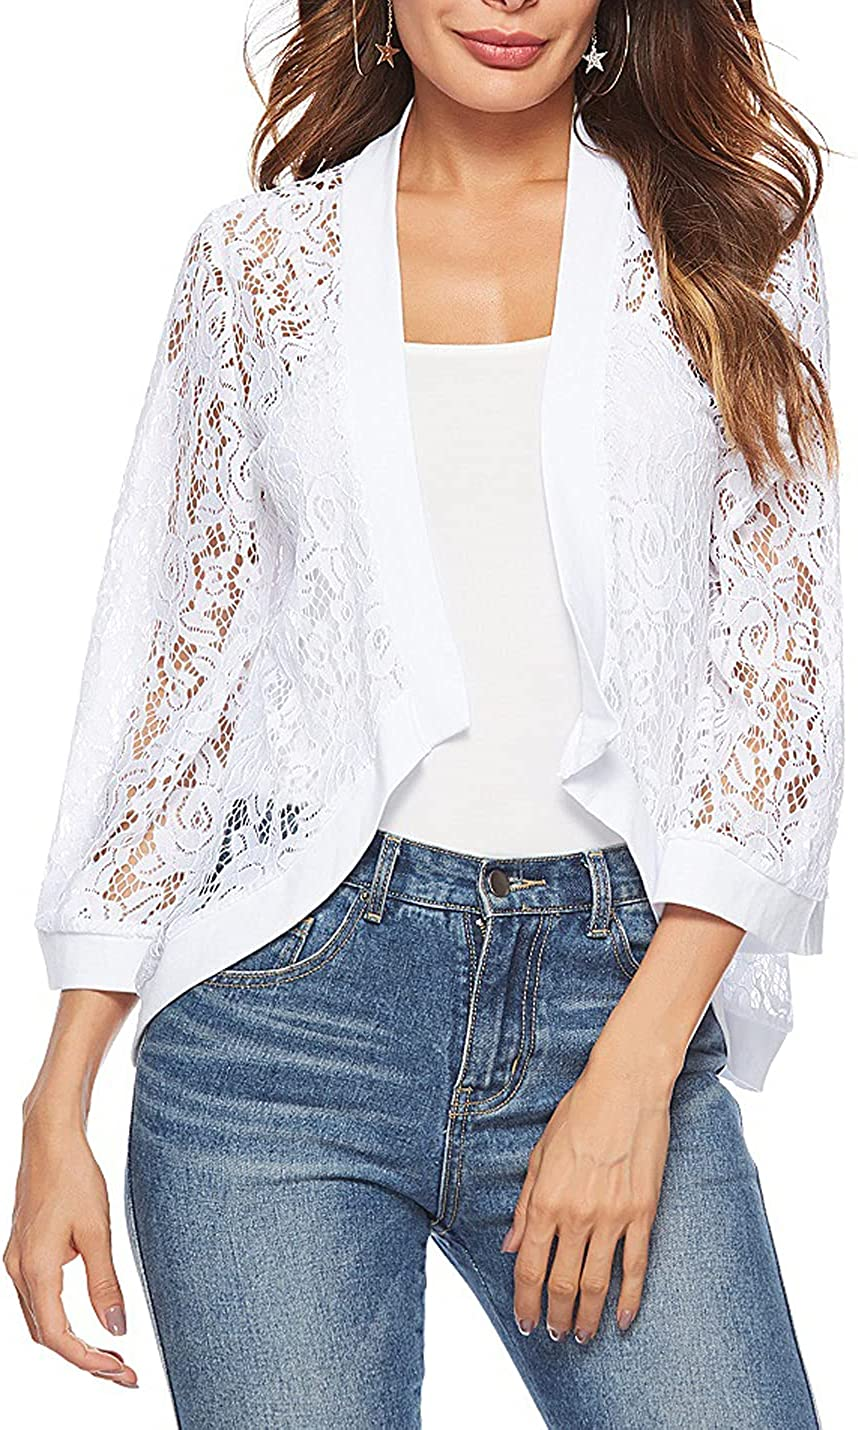 PEHMEA Women's 3/4 Sleeve Floral Lace Shrug Open Front Bolero Cardigan Crop Jacket (White, s)